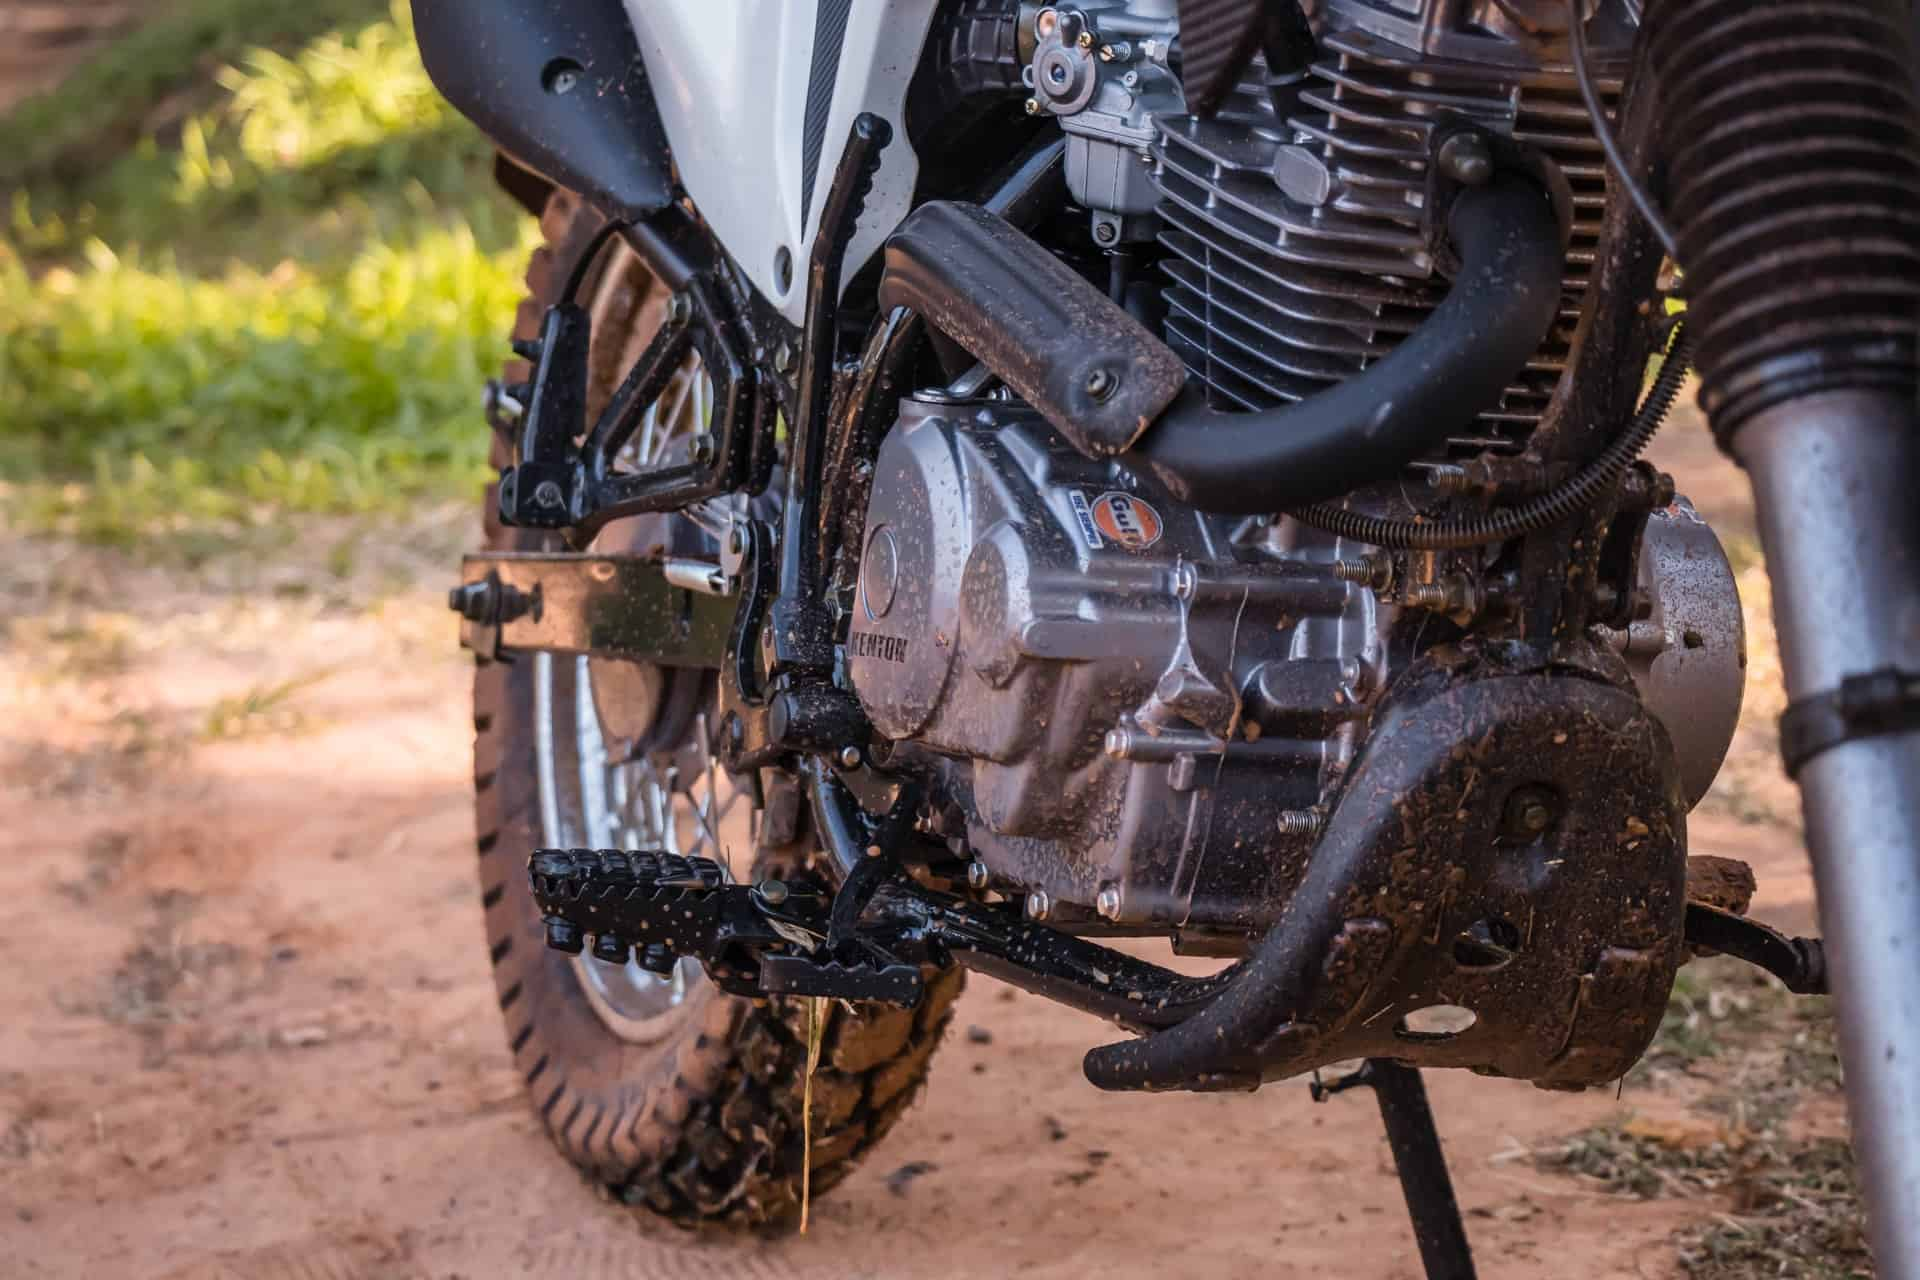 cylinder muddy engine bike